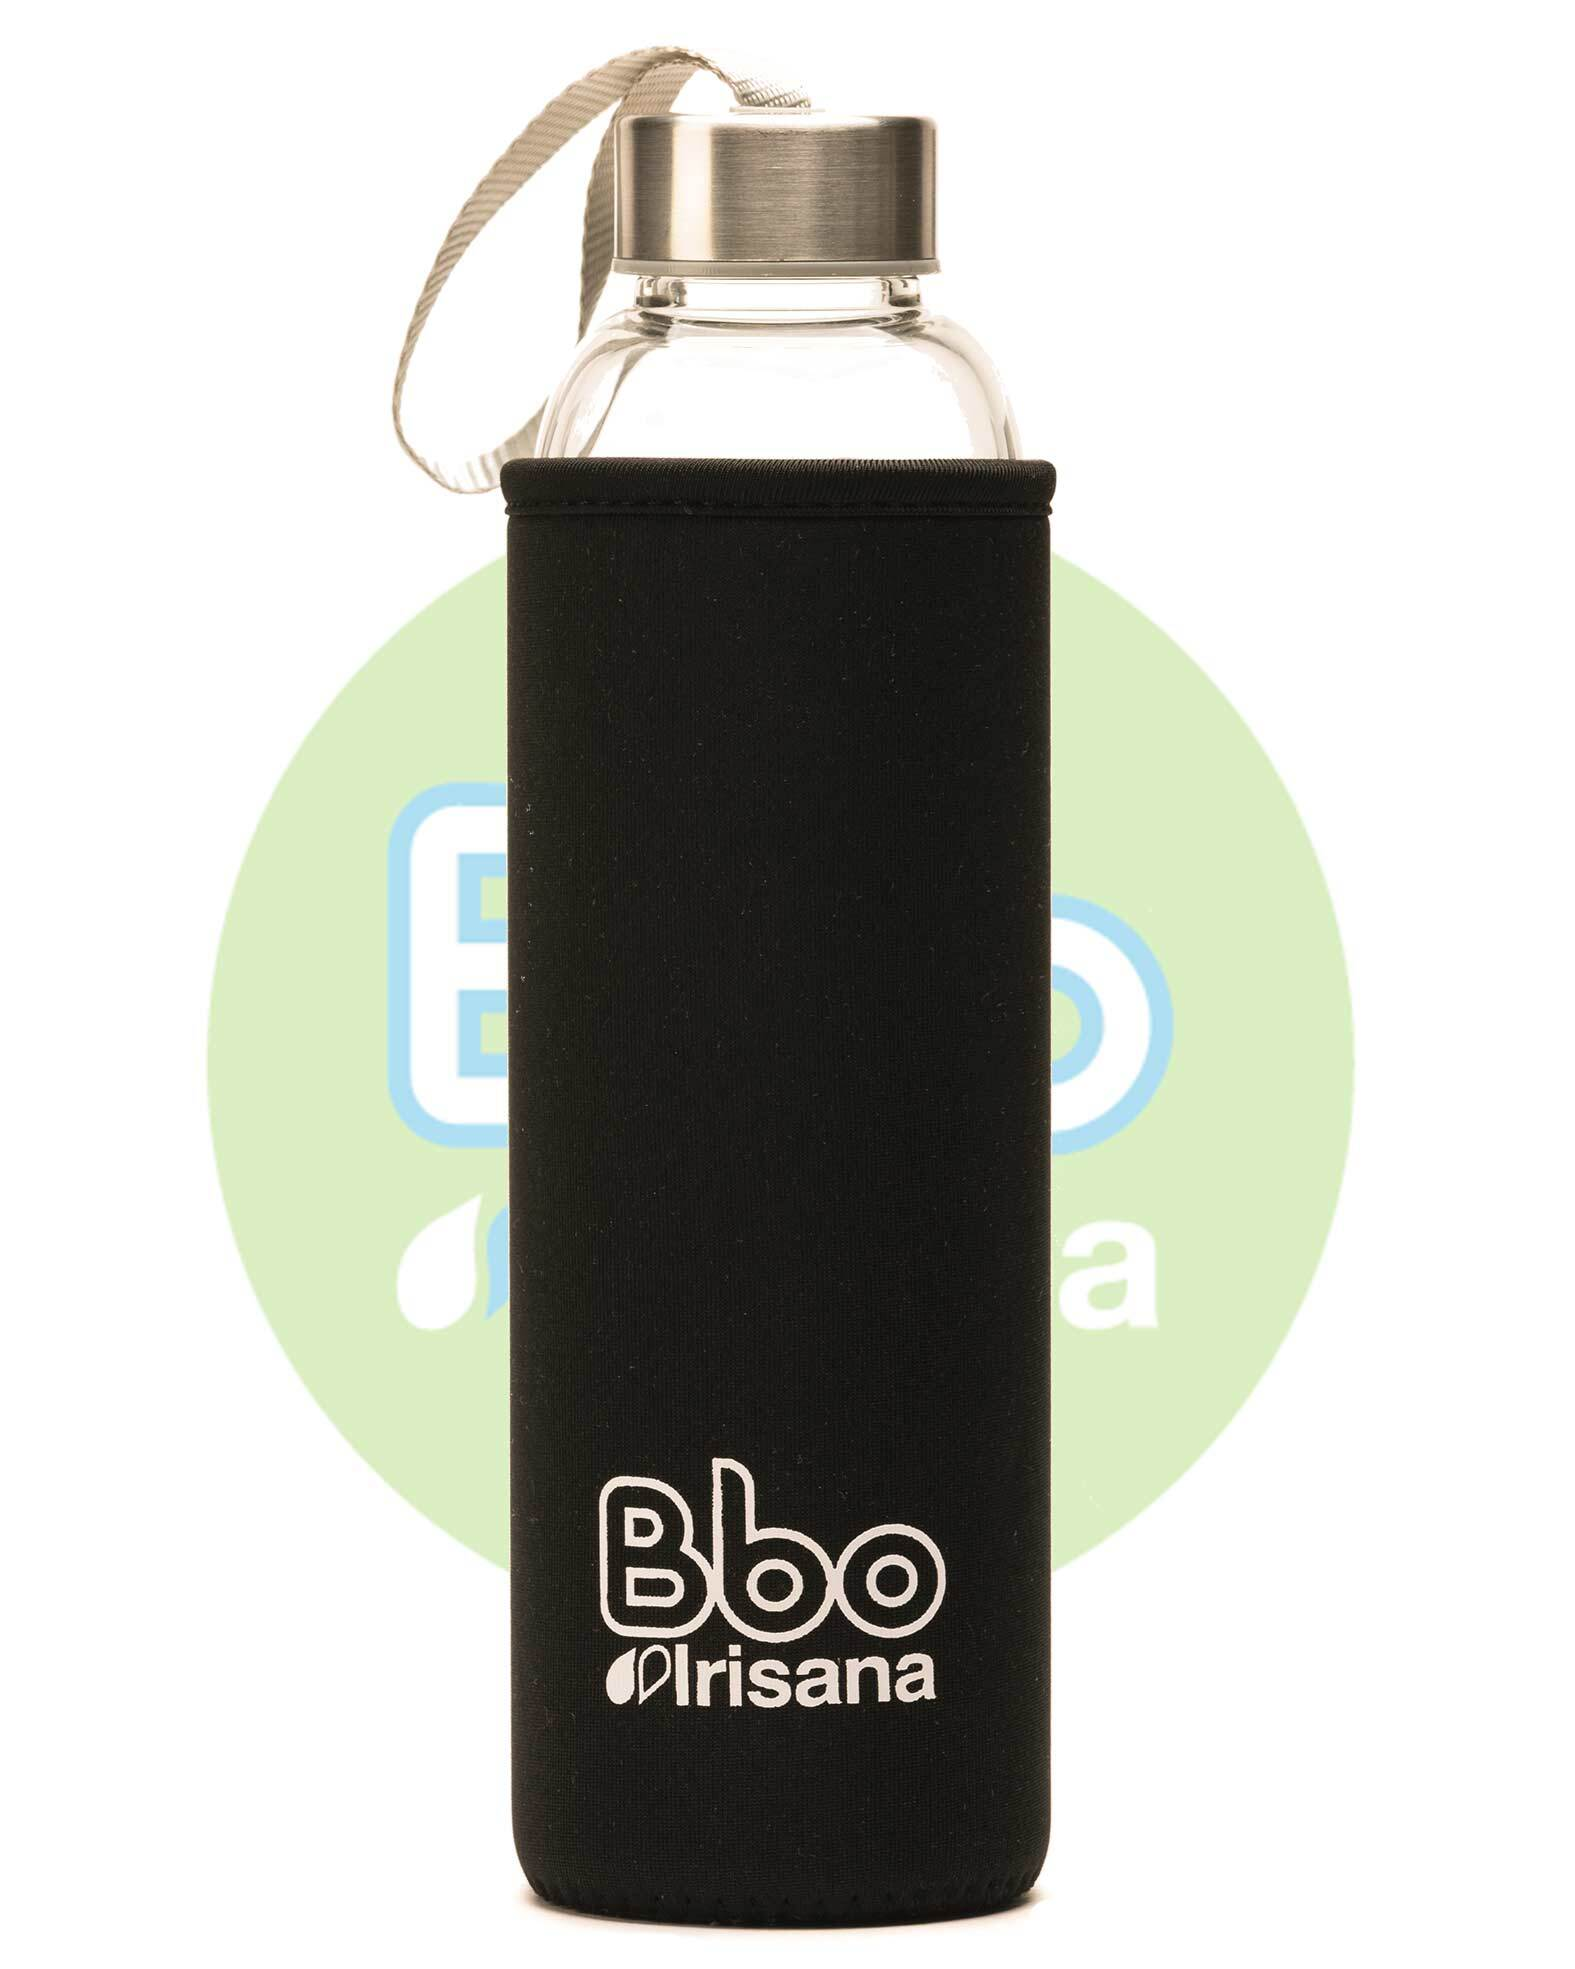 BOTELLA BBO NEGRO BOROSILICATO CON NEOPRENO 550 ml. IRISANA en Biovegalia